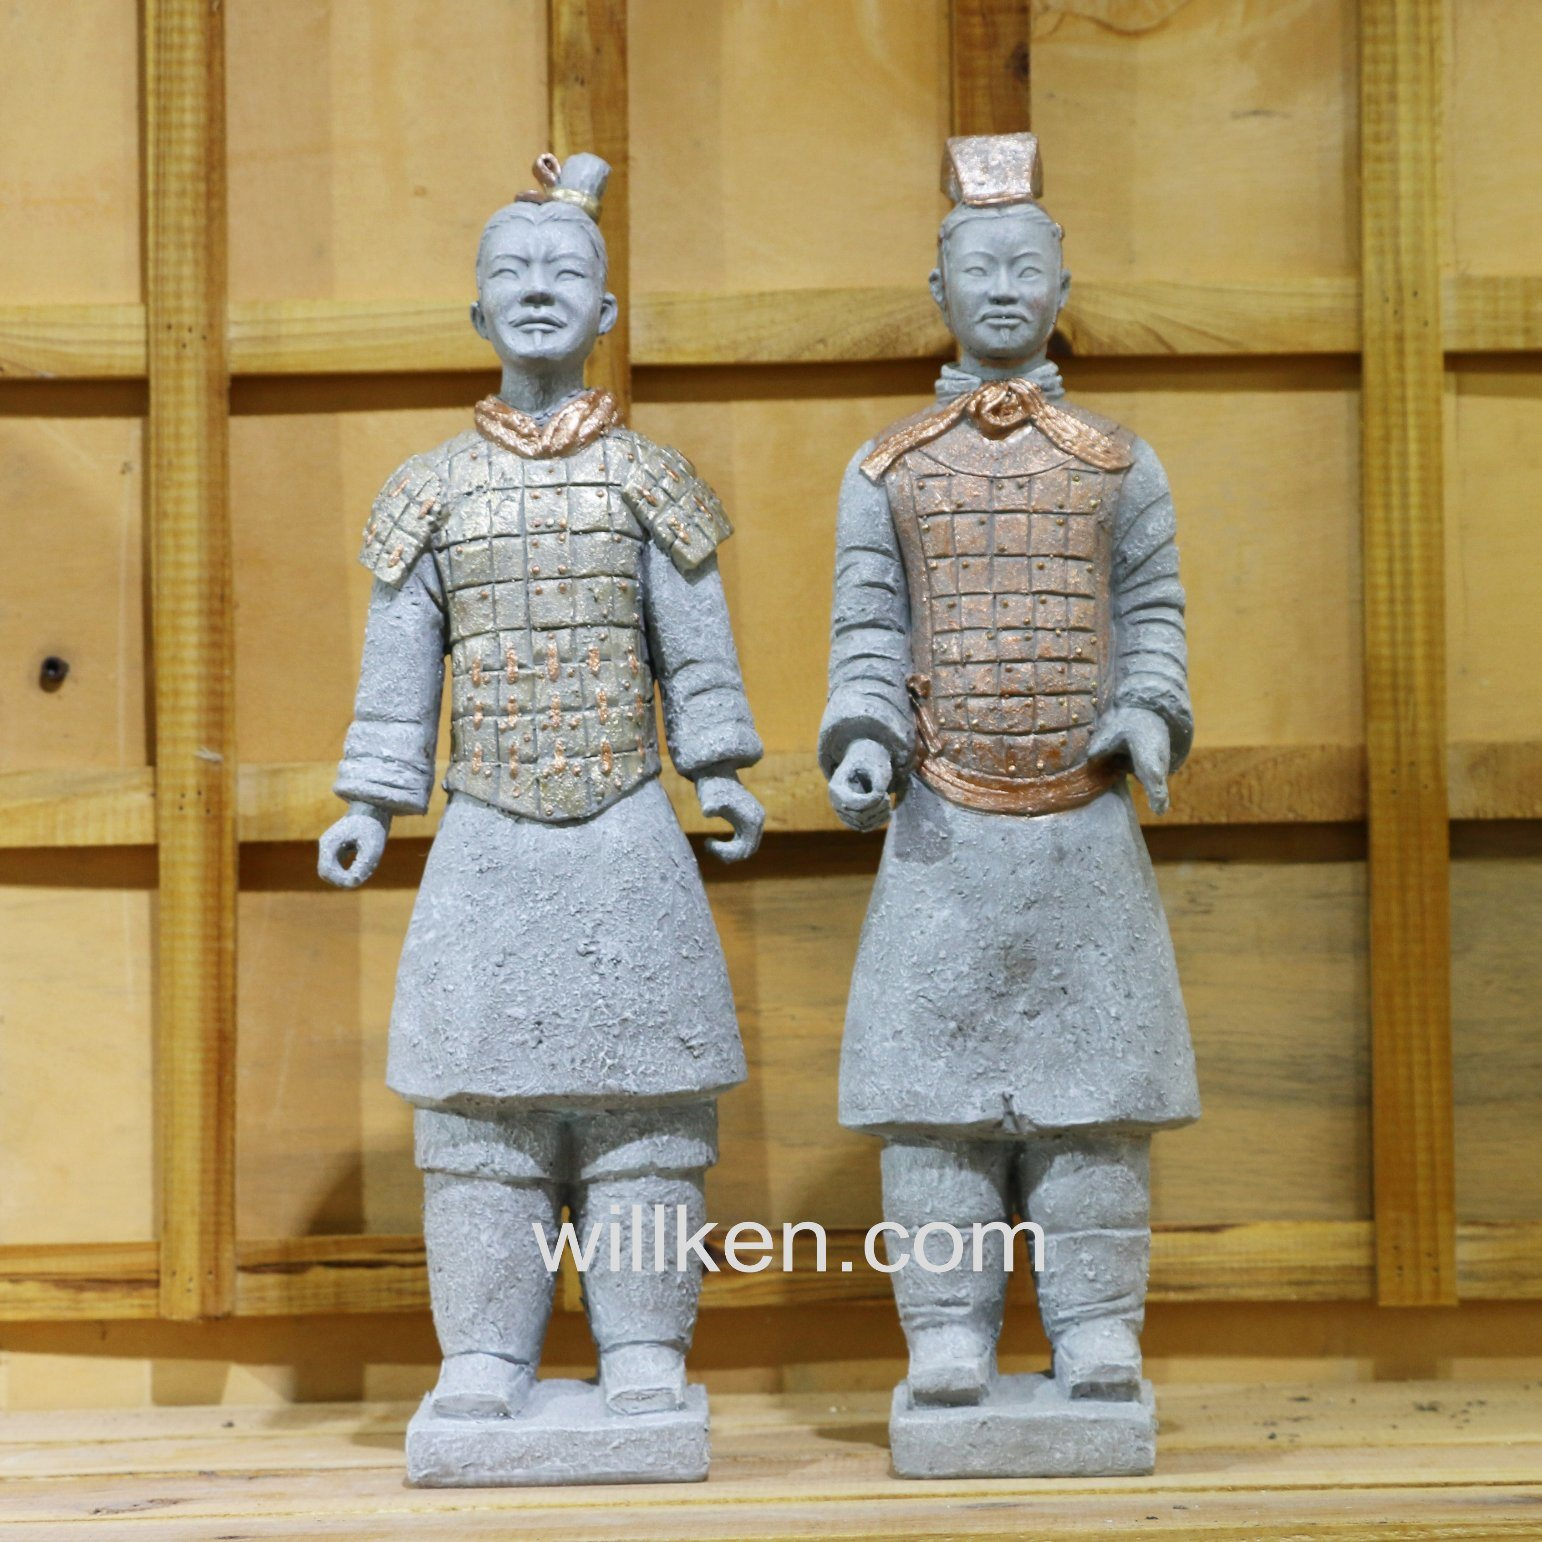 China Xiu2032an Antique Statues Replica Garden Decor Terracotta Warriors Statue    China Garden Statue, Garden Decoration